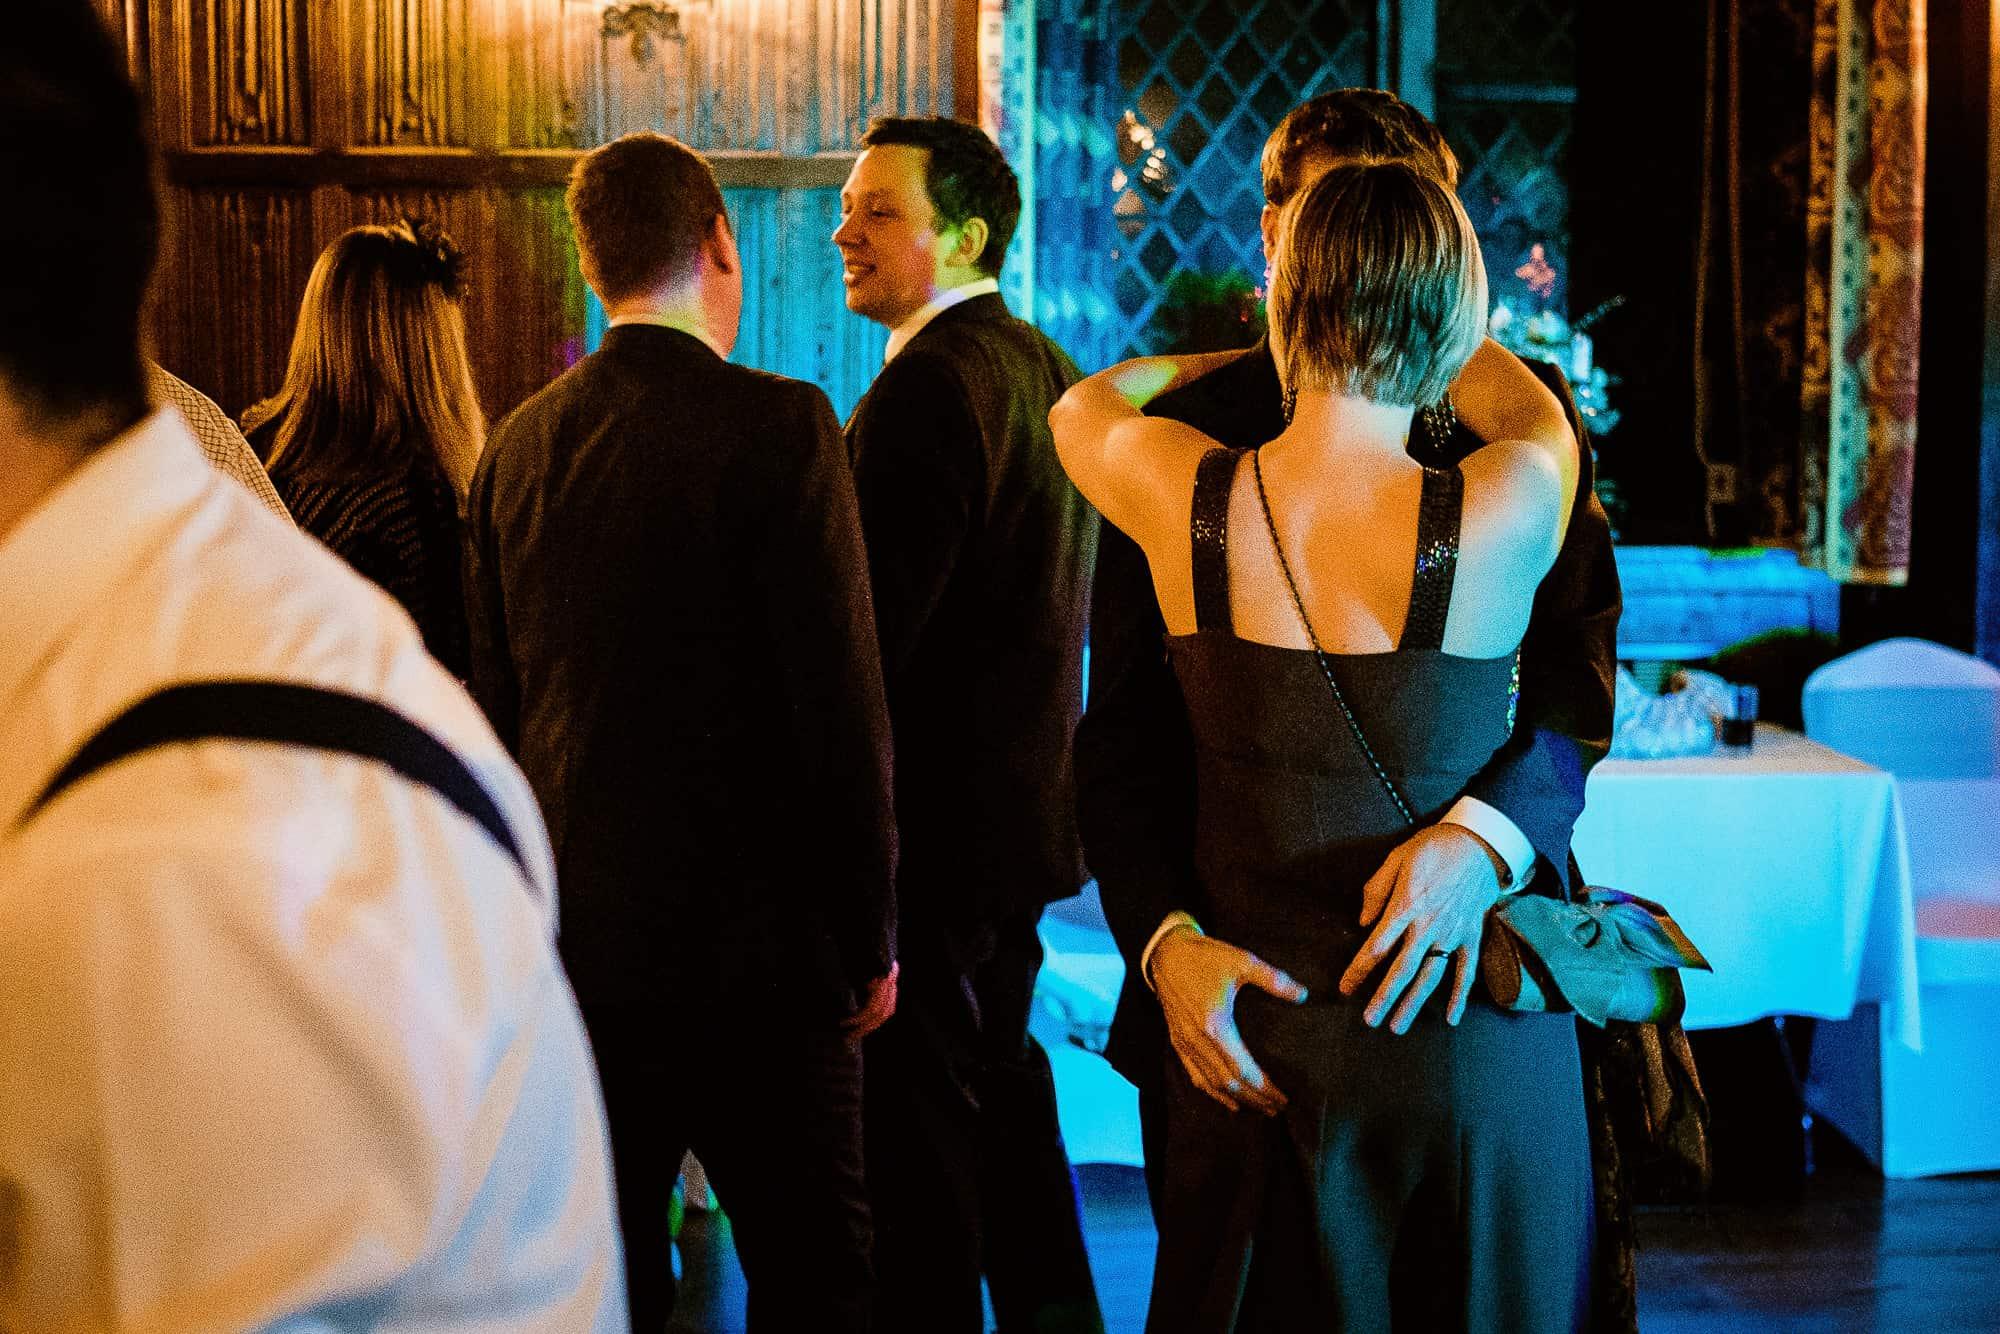 lympne-castle-wedding-photographer-matt-tyler-0050